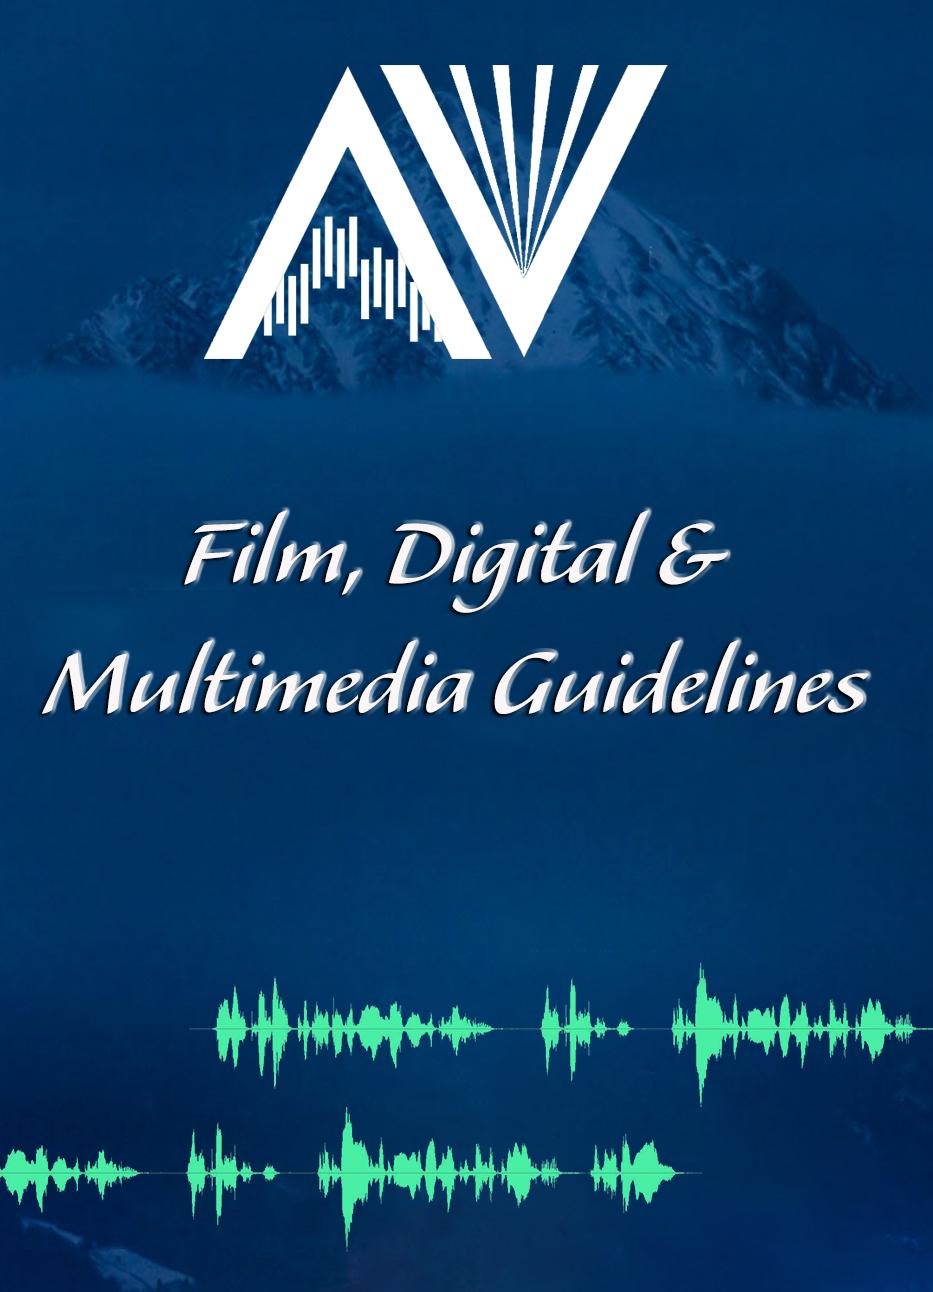 Multimedia Guidelines